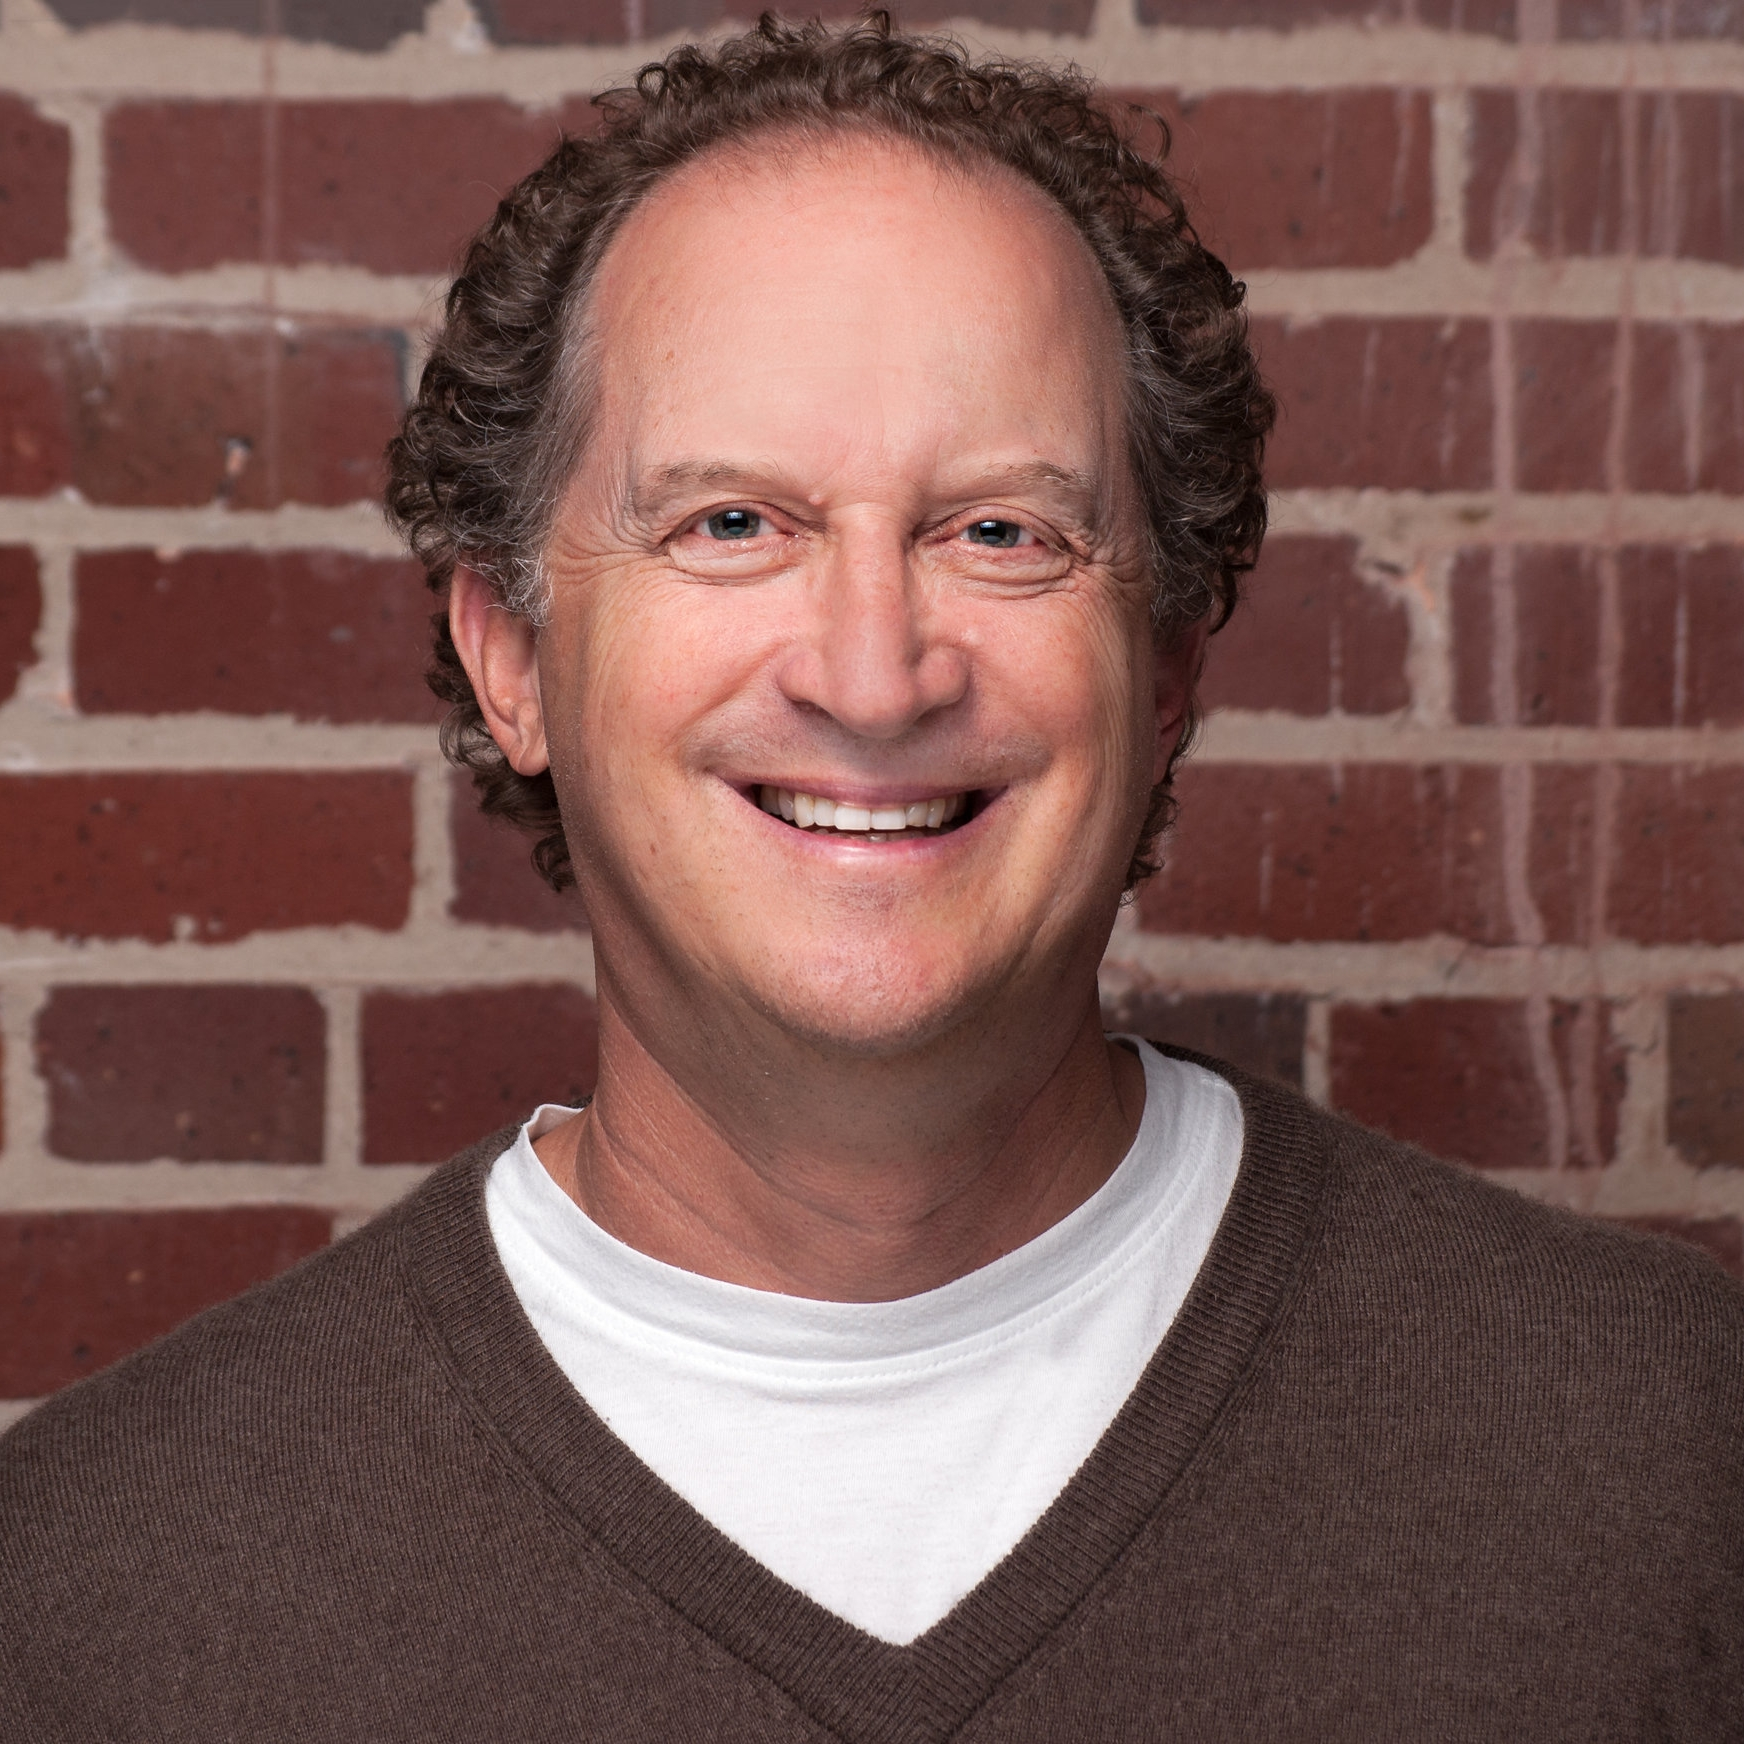 Jeff Levy Headshot 1.17.1.jpg